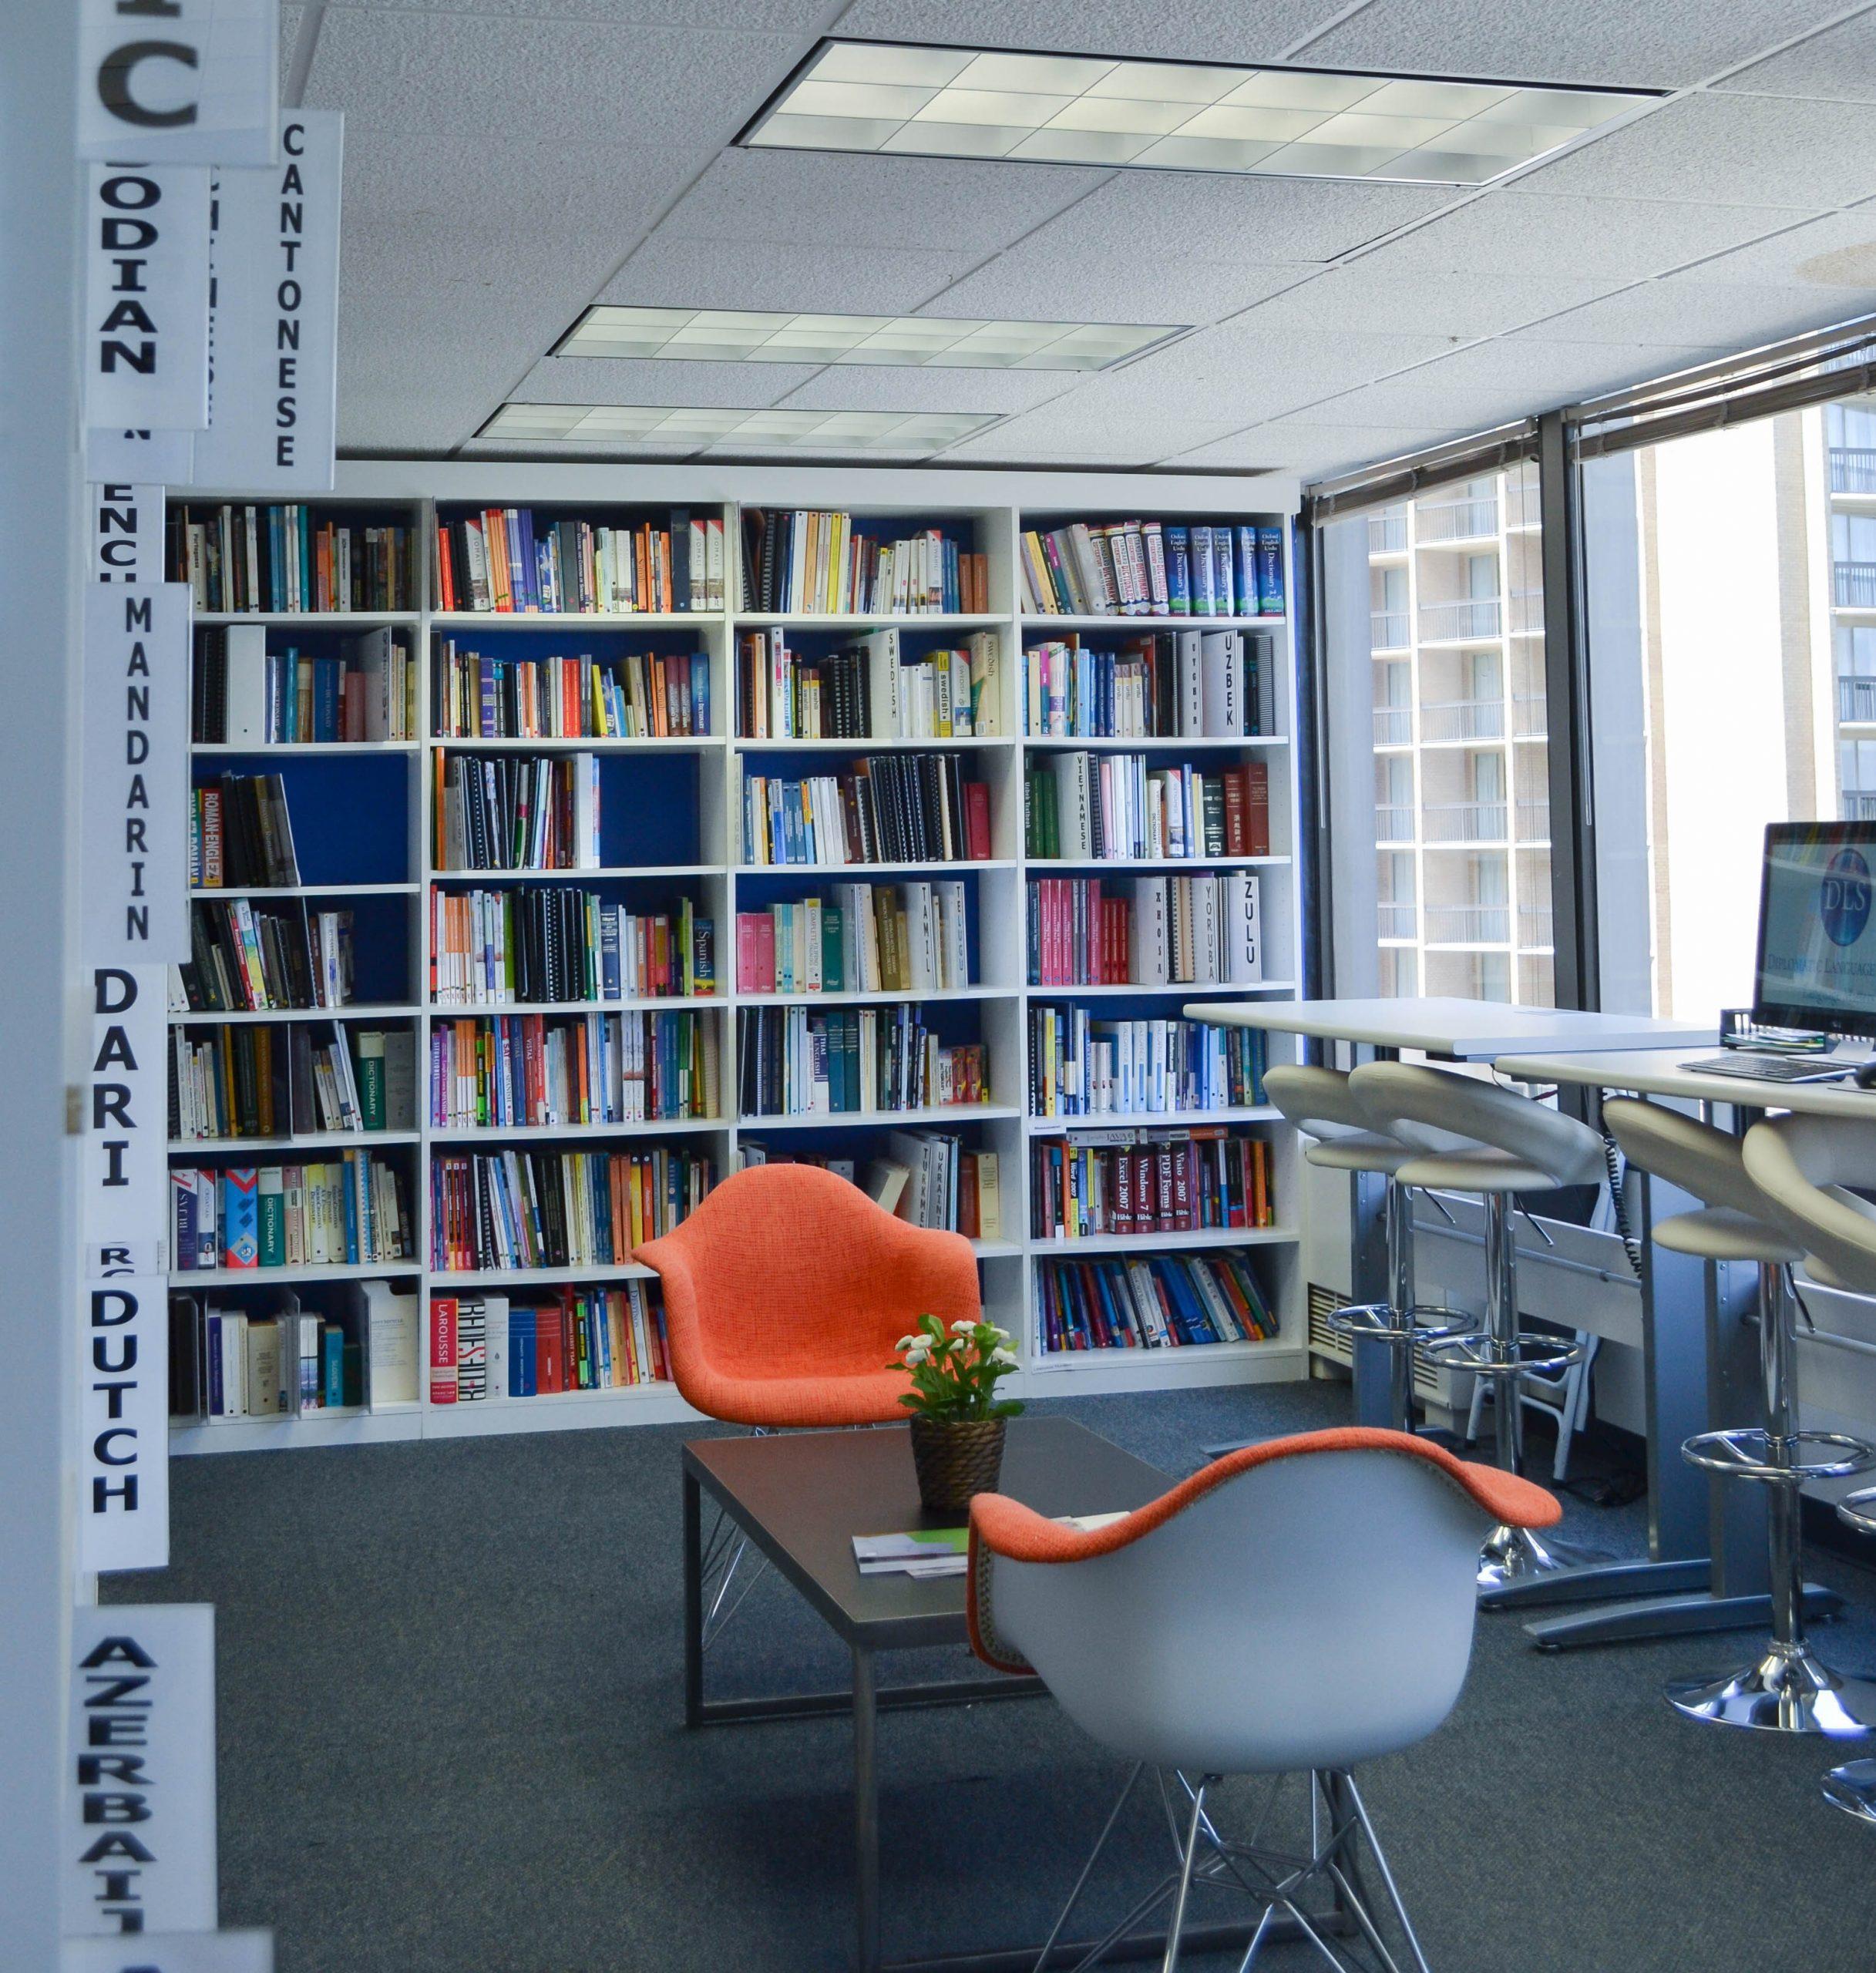 Diplomatic Language Services Arlington location library